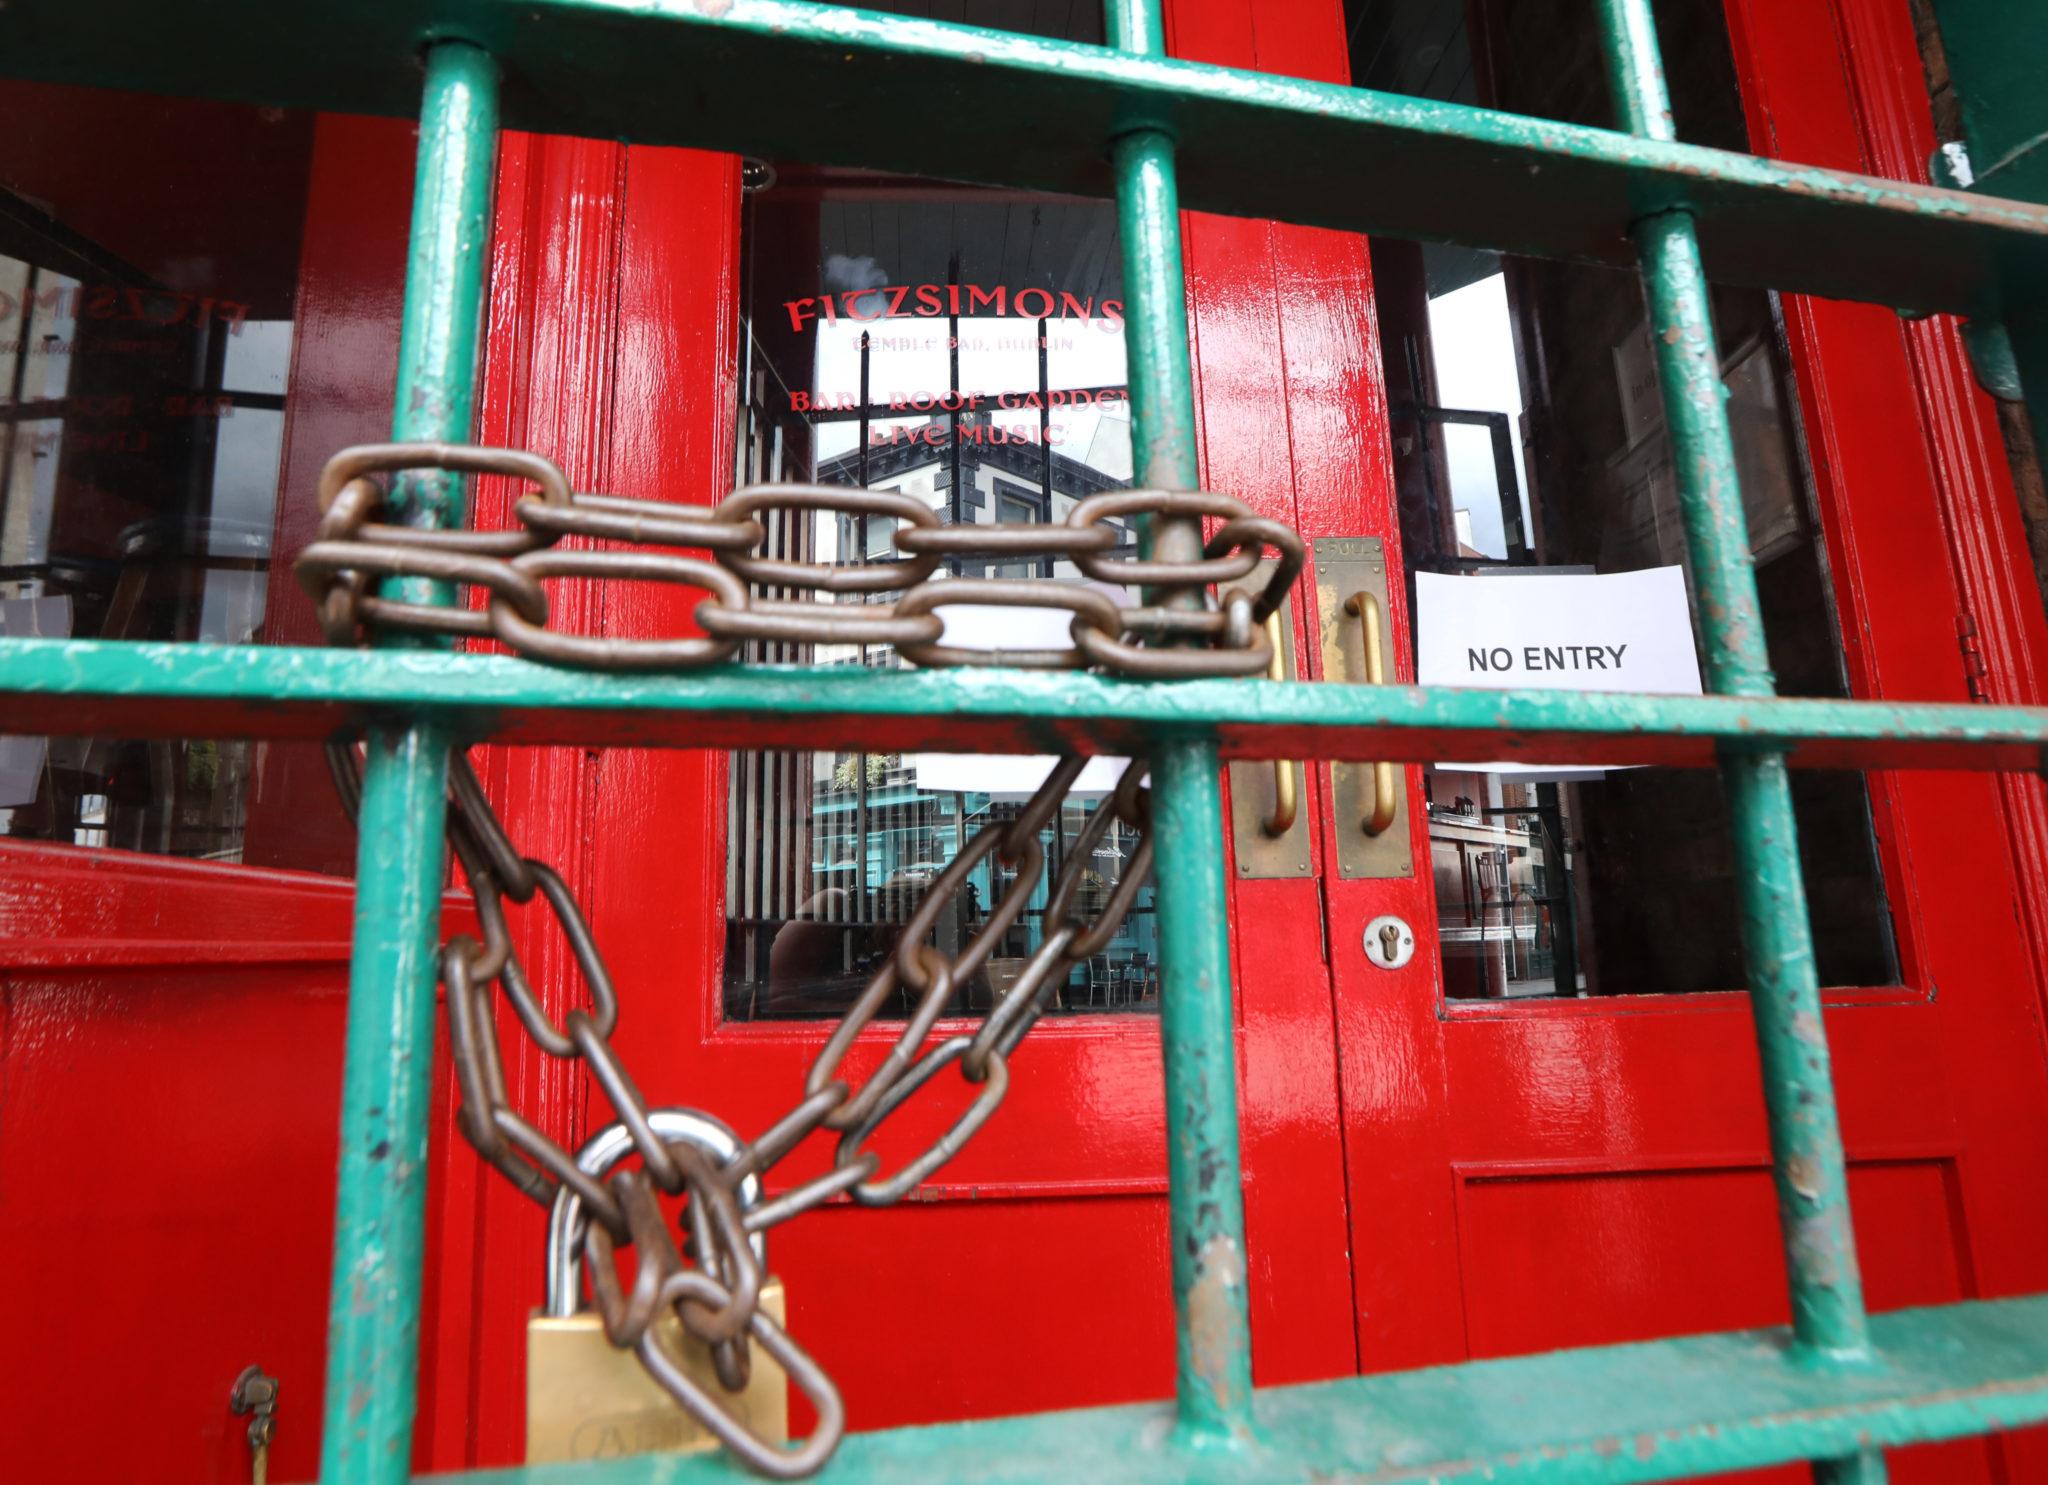 The locked gates at the Fitzsimons pub in Temple Bar Dublin